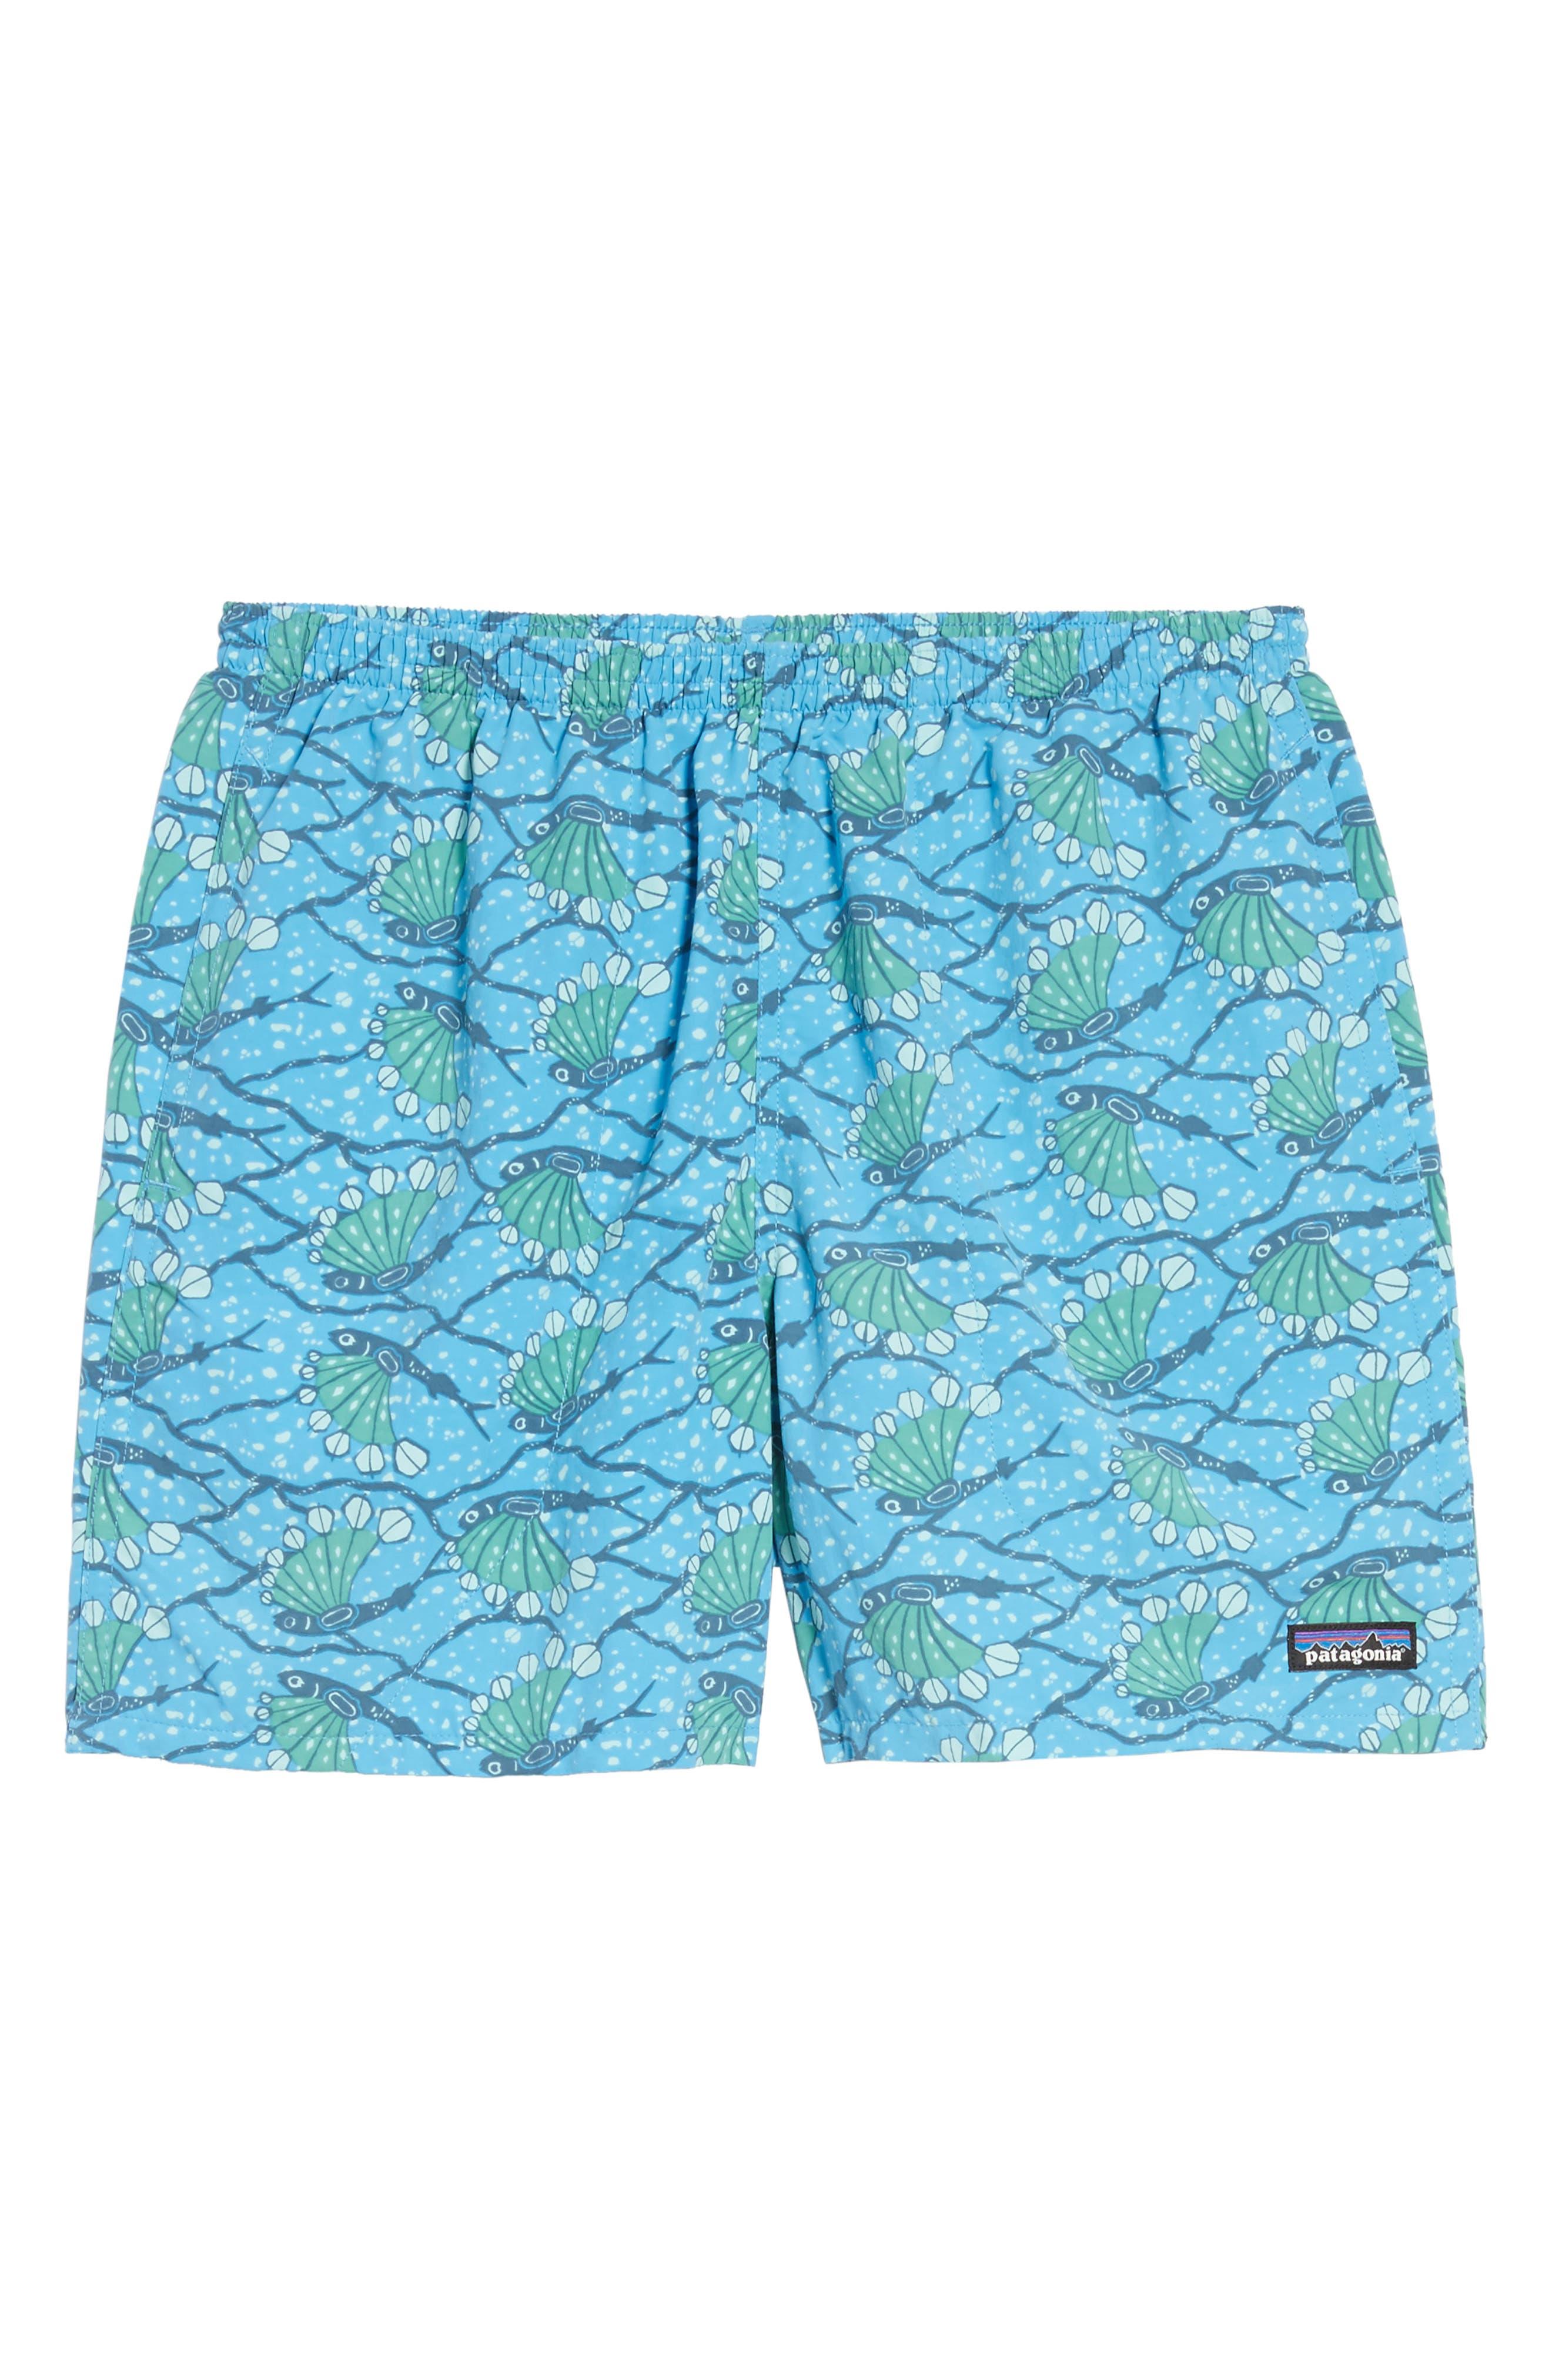 Baggies 5-Inch Swim Trunks,                             Alternate thumbnail 6, color,                             Hexy Fish Radar Blue